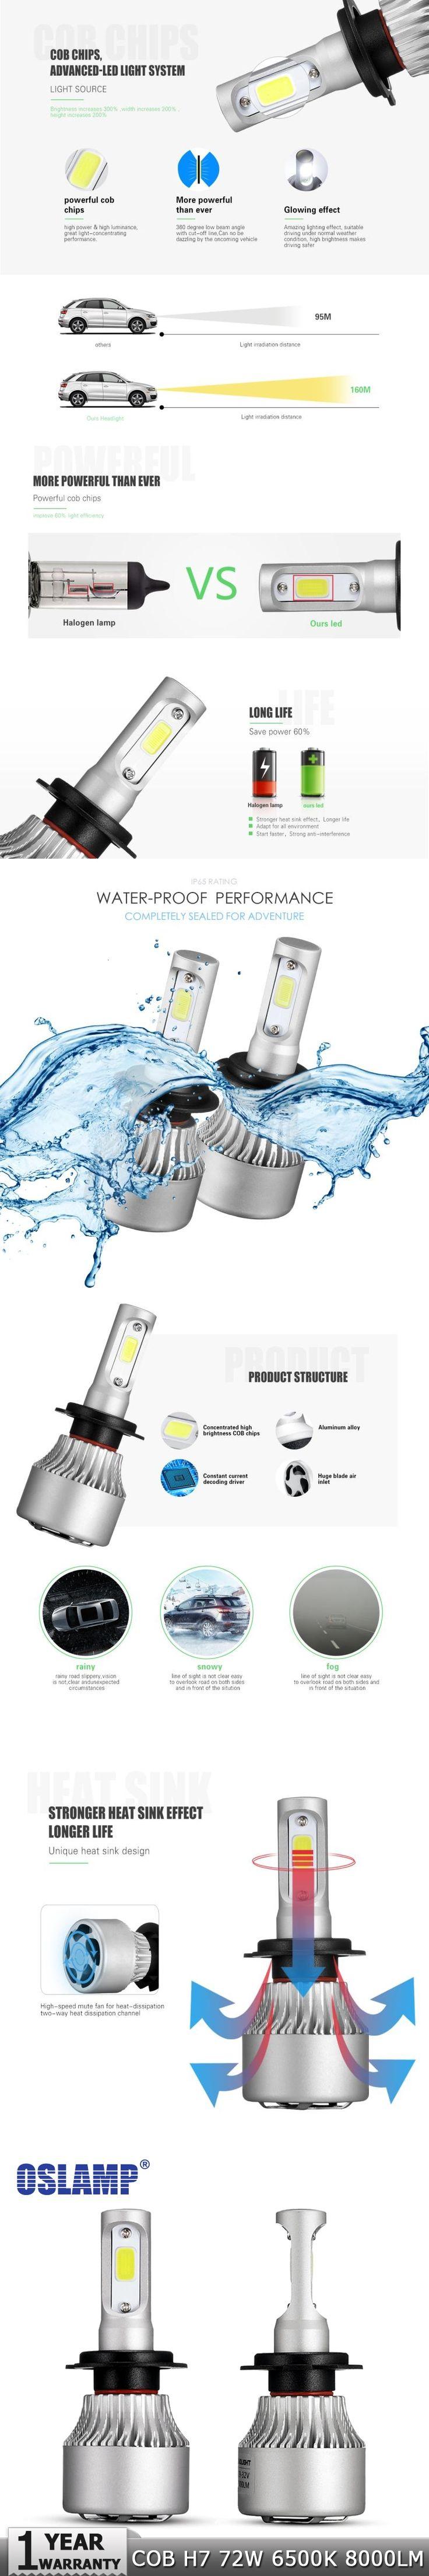 Oslamp H7 COB LED Car Headlights Bulb Kit 72W 8000lm Auto Front Light H7 Fog Light Bulbs 6500K 12V 24V Led Automotive Headlamps